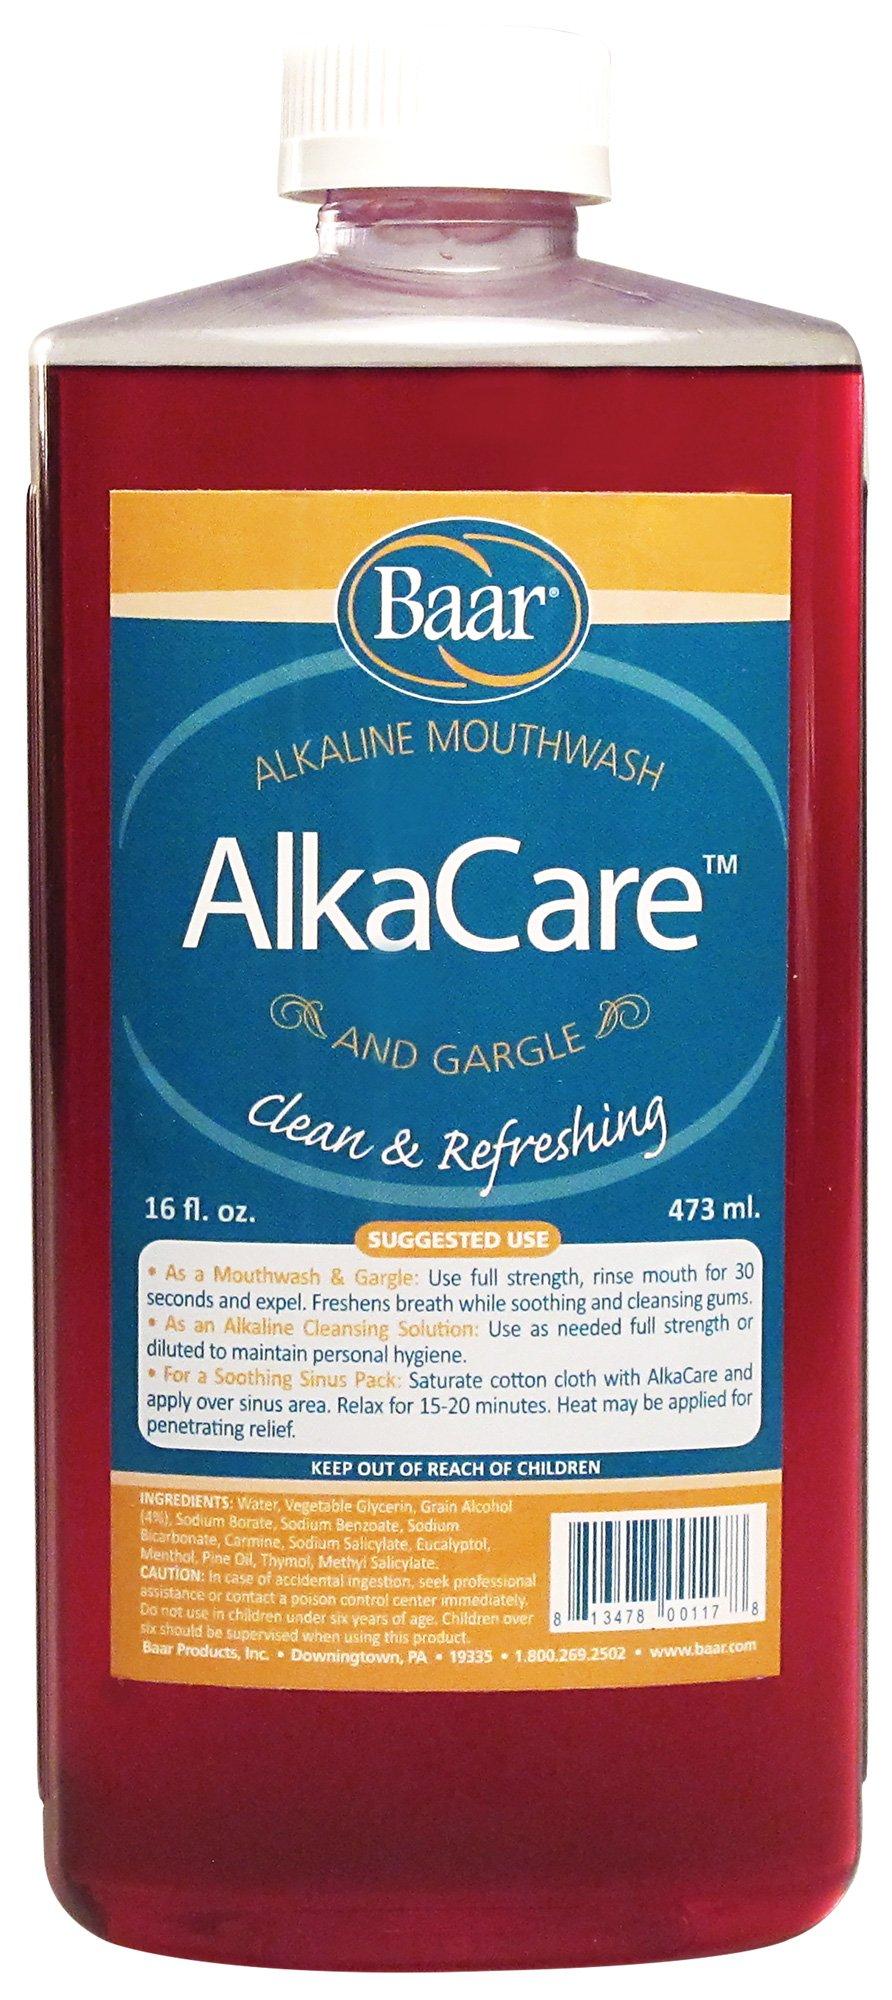 AlkaCare Mouthwash & Gargle, 16 Oz.